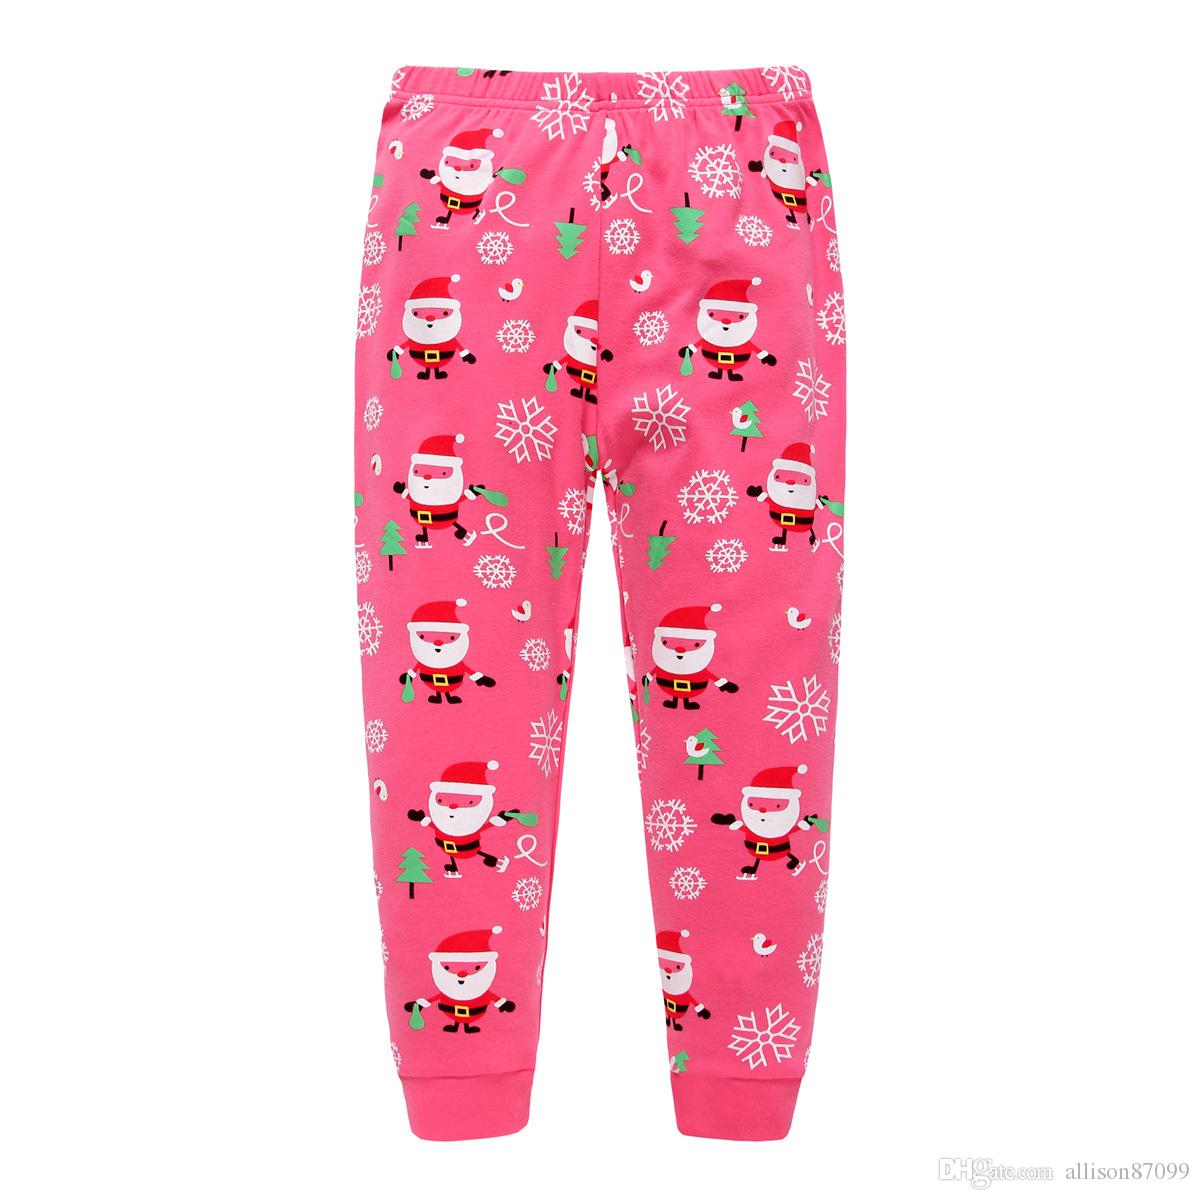 Hotsale Christmas Pajamas for Baby girls Santa clause Nightwear Pyjamas set 100%Cotton Sleepwear homewear 2017 Autumn Winter wholesale